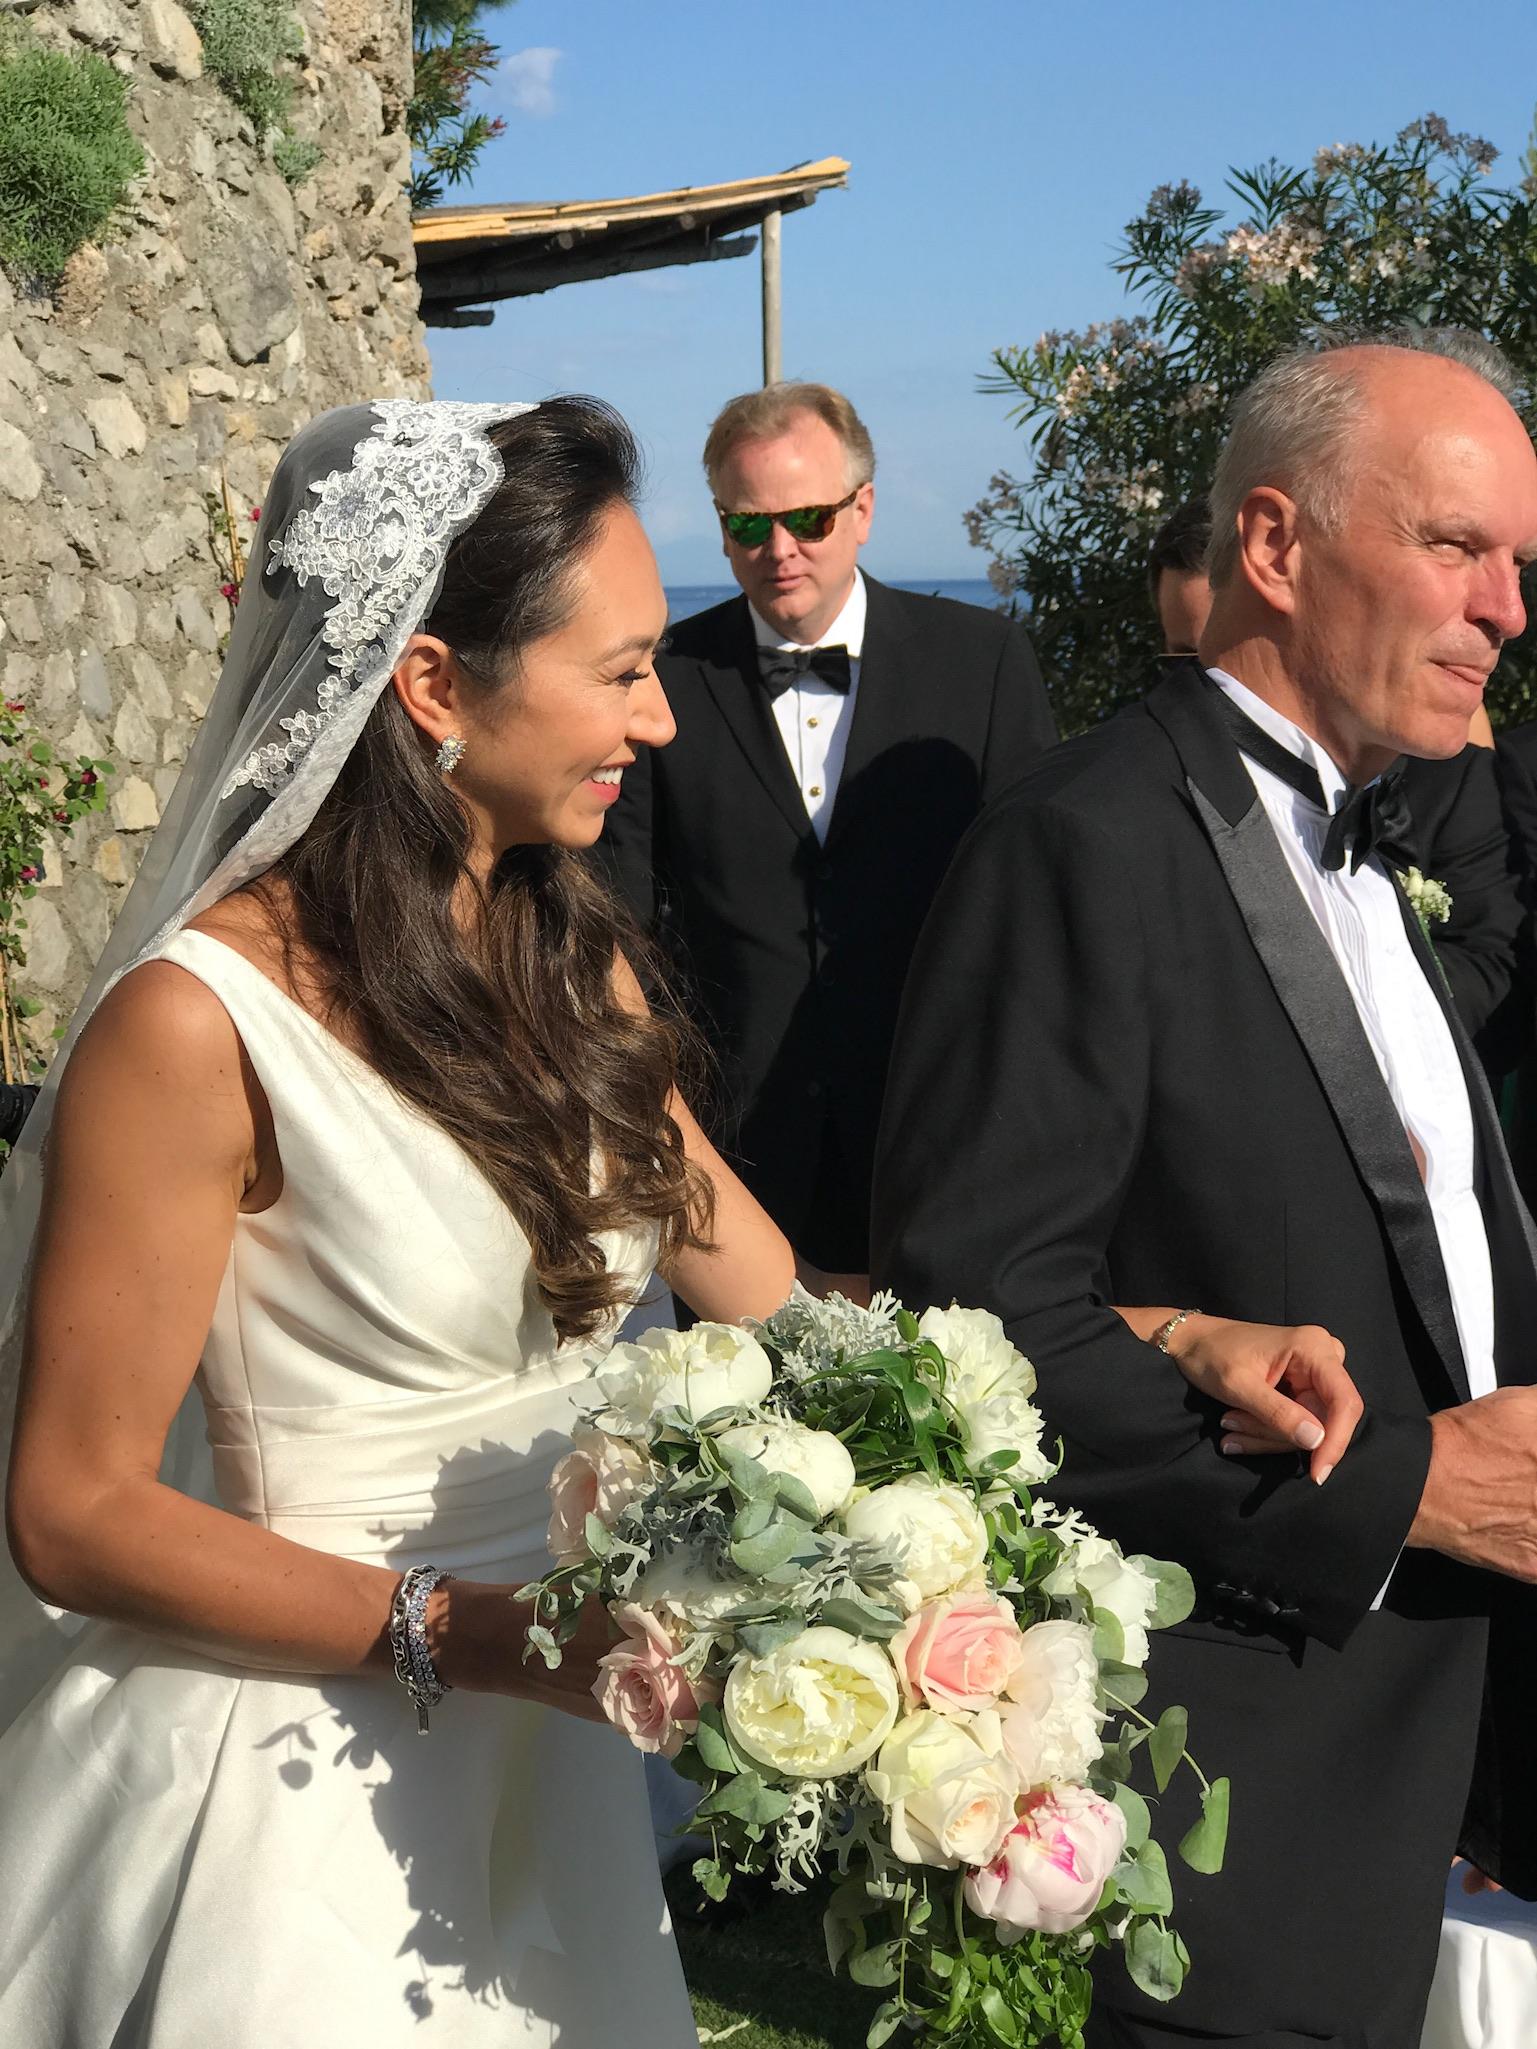 http://www.weddingamalfi.com/wp-content/uploads/Nathalie-and-Benjamin-Wedding-in-Positano-Italy-17.jpg